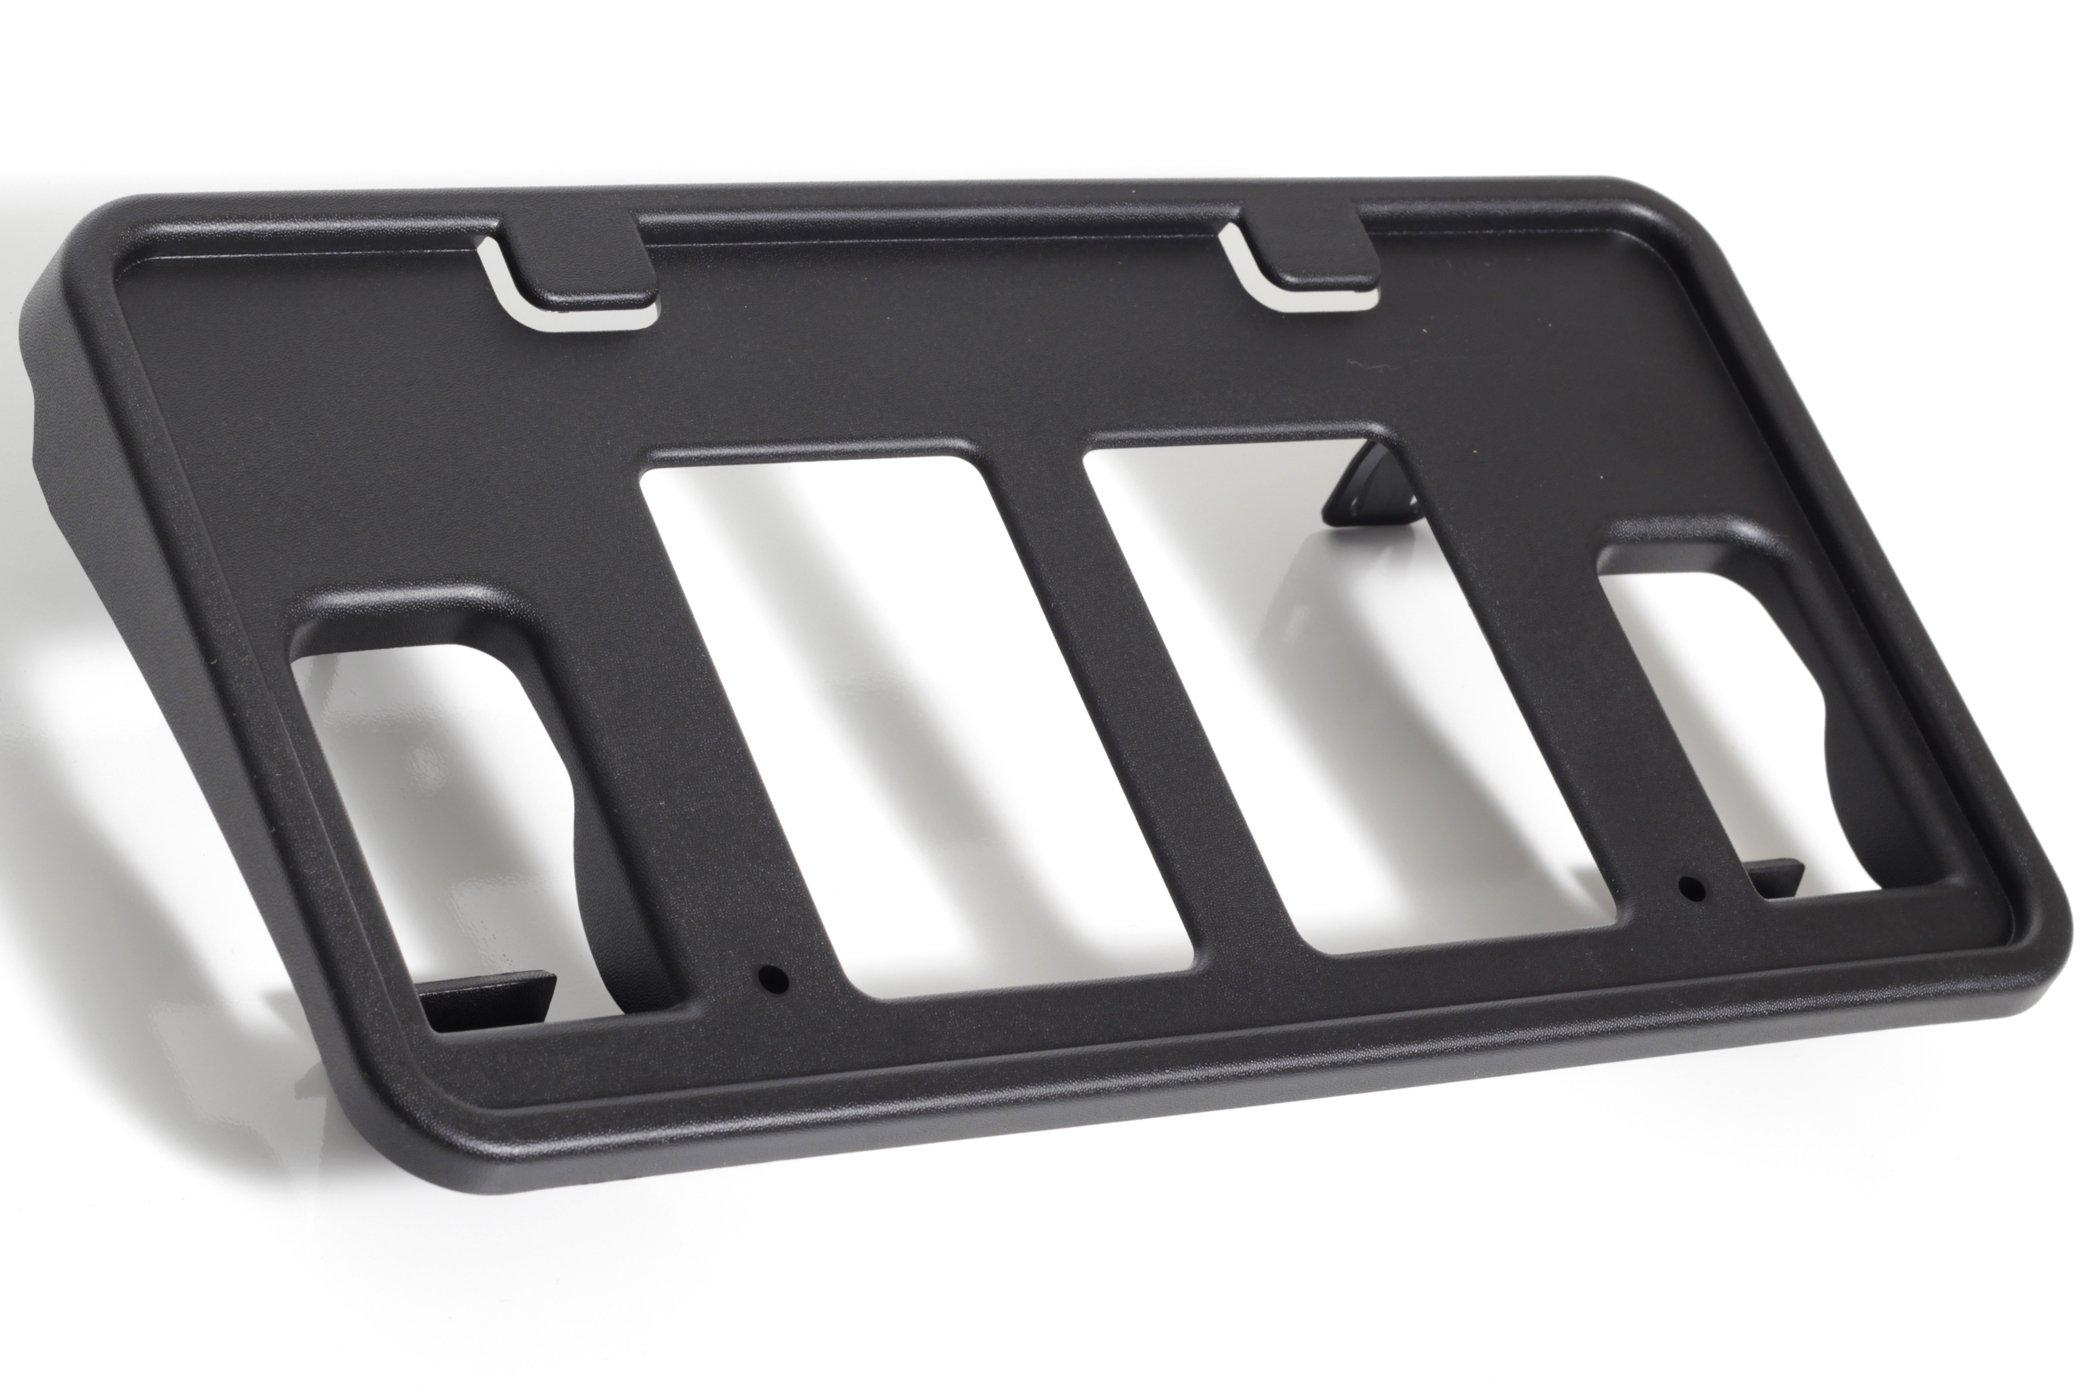 New for 2011-2014 Ford Edge Front Bumper License Plate Bracket Holder Plastic Black FO1068133 BT4Z17A385C